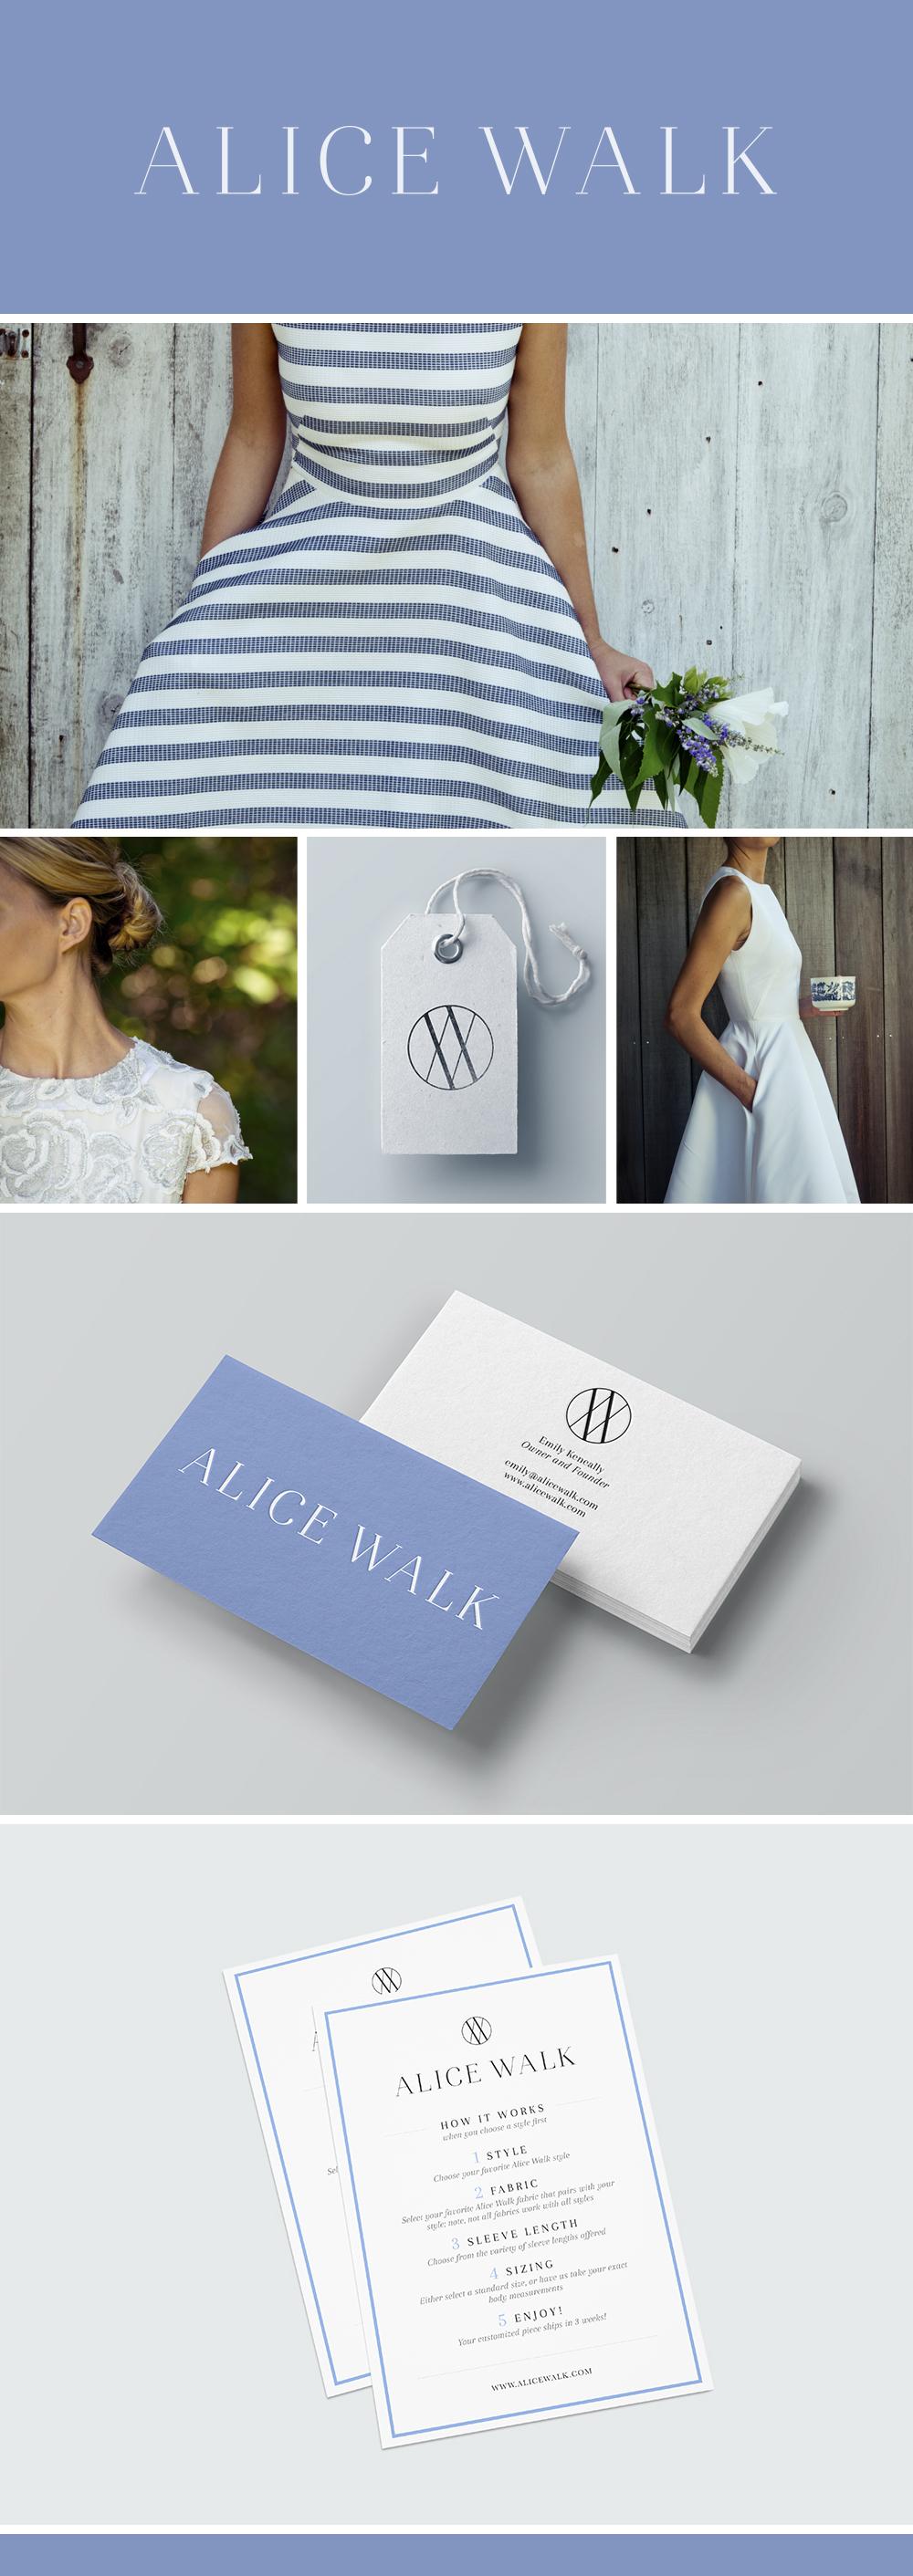 Alice Walk branding by JSGD